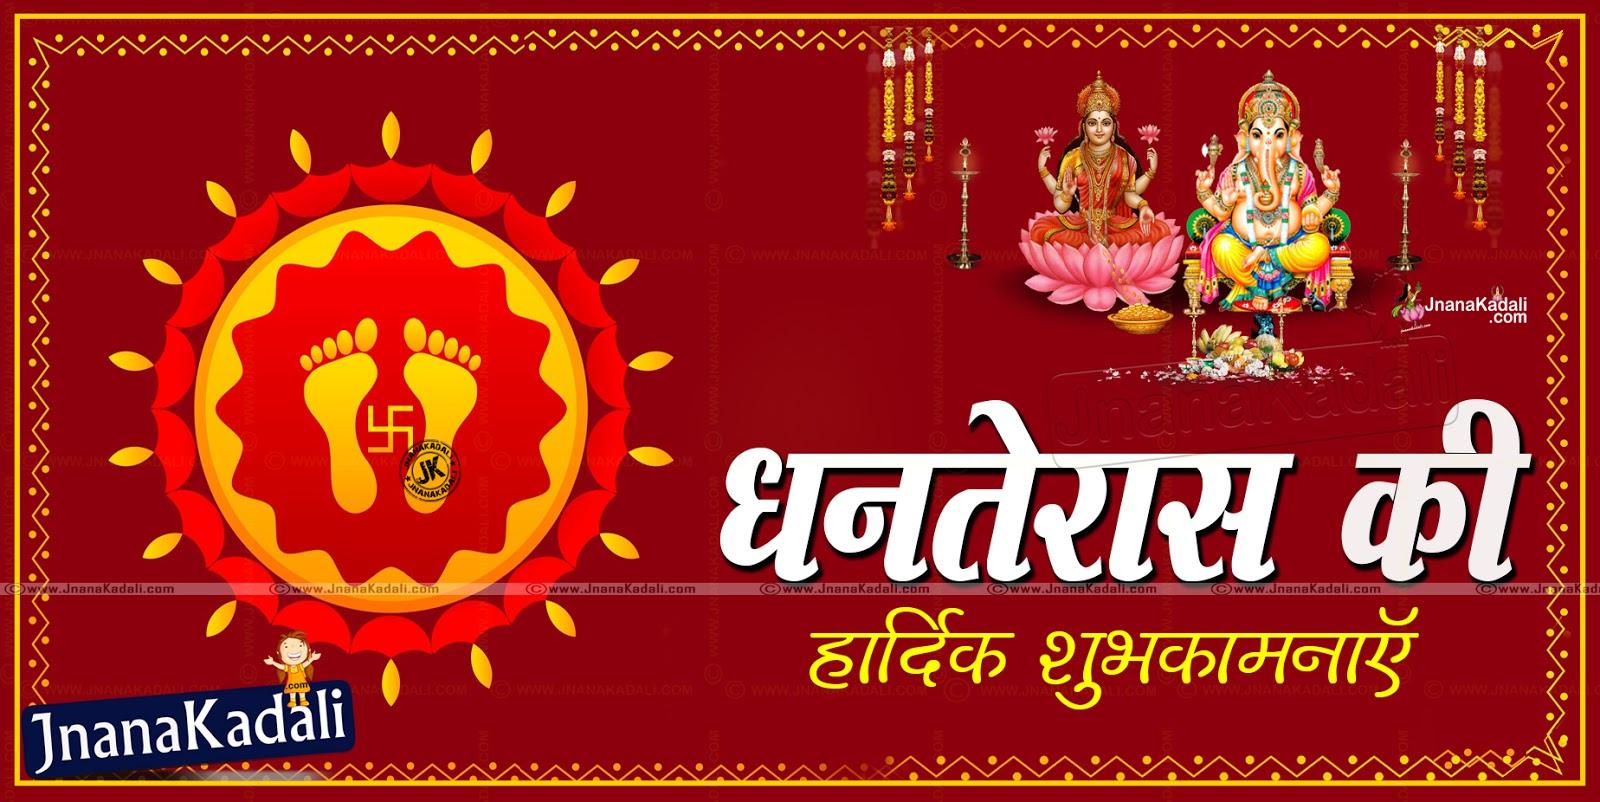 ... Wallpapers-Upcoming Telugu Diwali Wishes with Lakshmi Devi Wallpapers